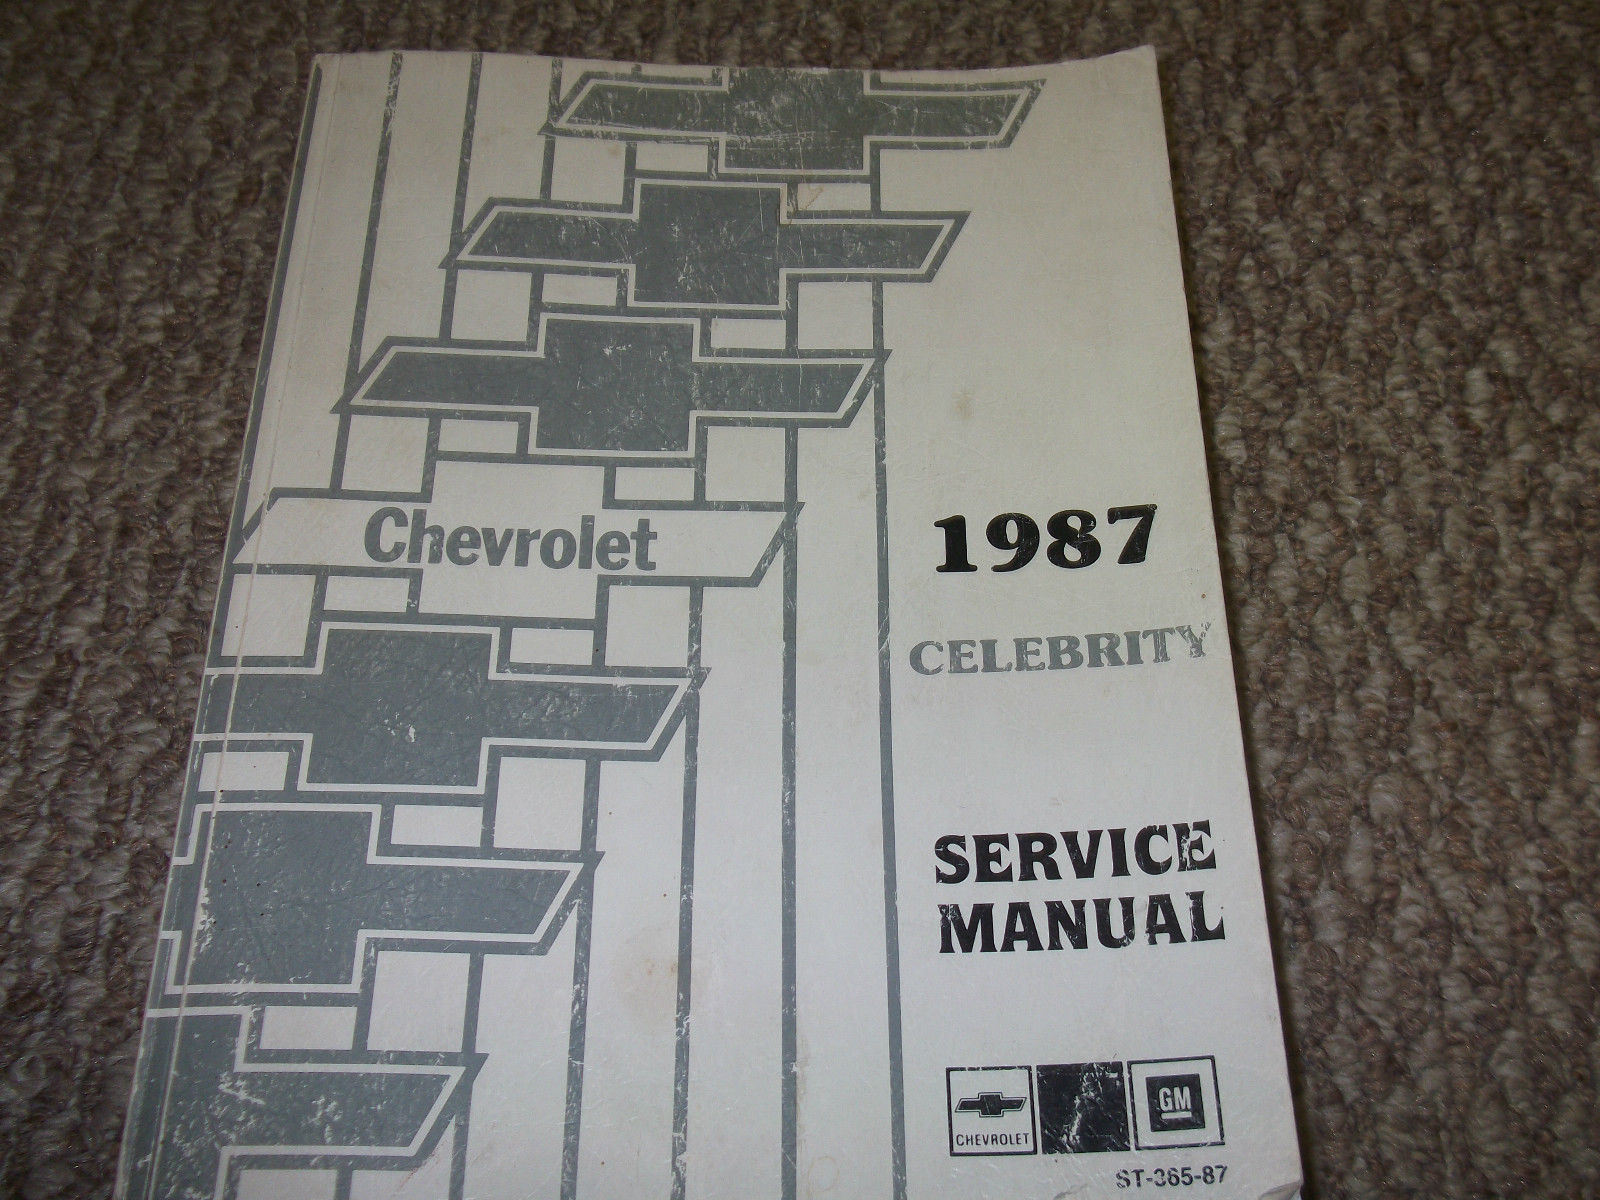 kgrhqfhj 8e9 82sfnmbptcu 8poq 60 57. kgrhqfhj 8e9 82sfnmbptcu 8poq 60 57.  1987 Chevrolet Chevy CELEBRITY Service Shop Repair Manual FACTORY 87 BOOK  OEM ...